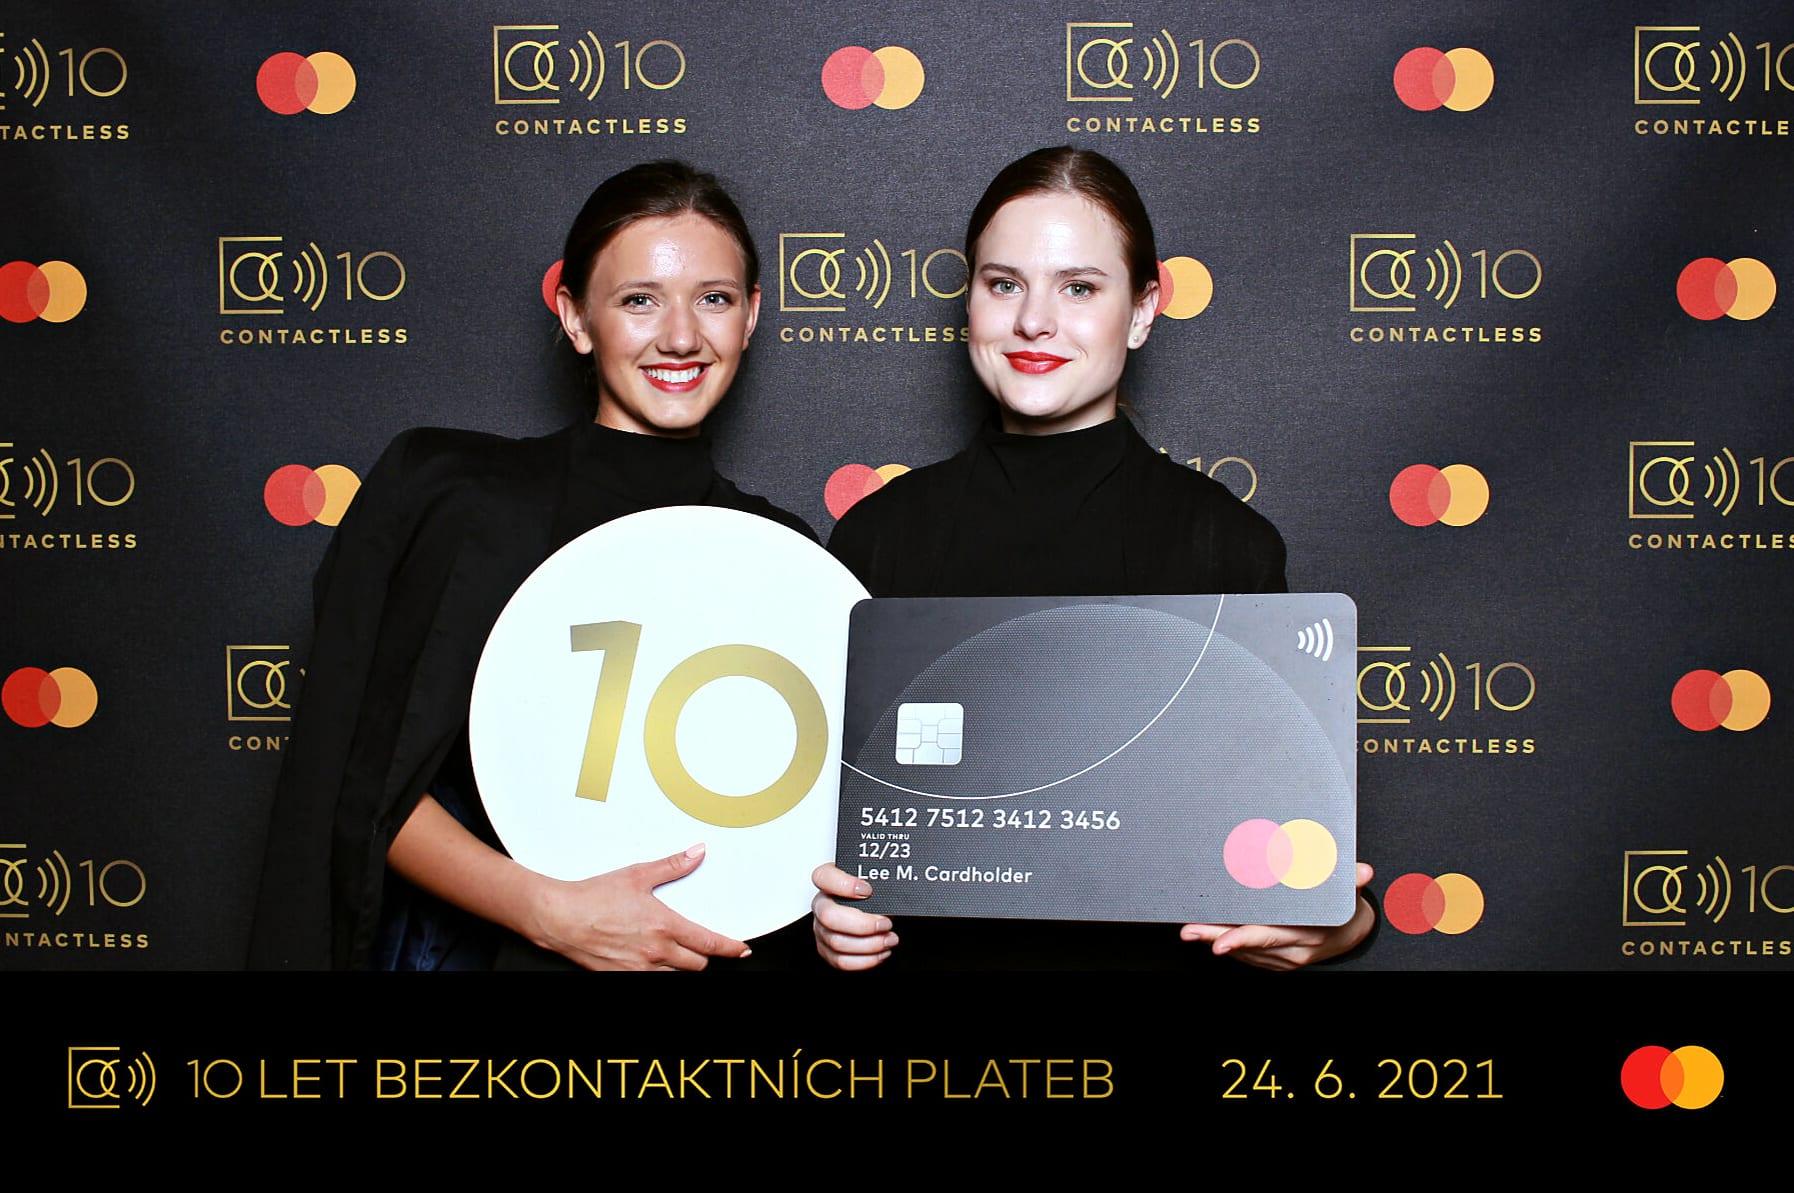 fotokoutek-mastercard-10-let-bezkontaktnich-plateb-24-6-2021-734386